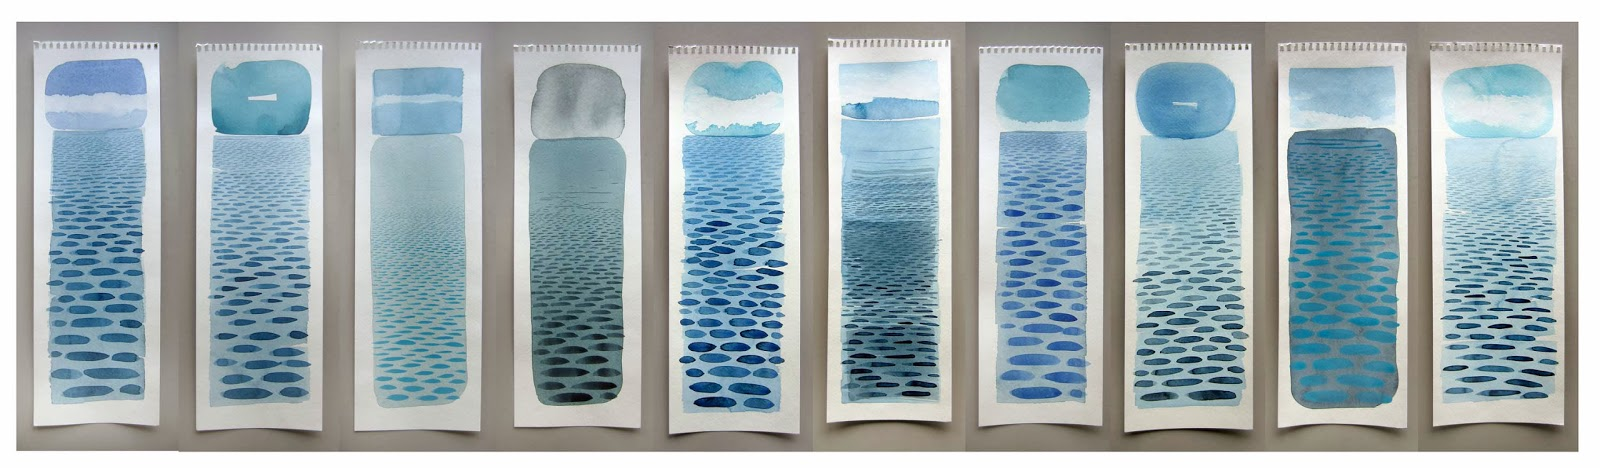 Recent 'Lake Michigan' Watercolors    - 6 x 18 inches